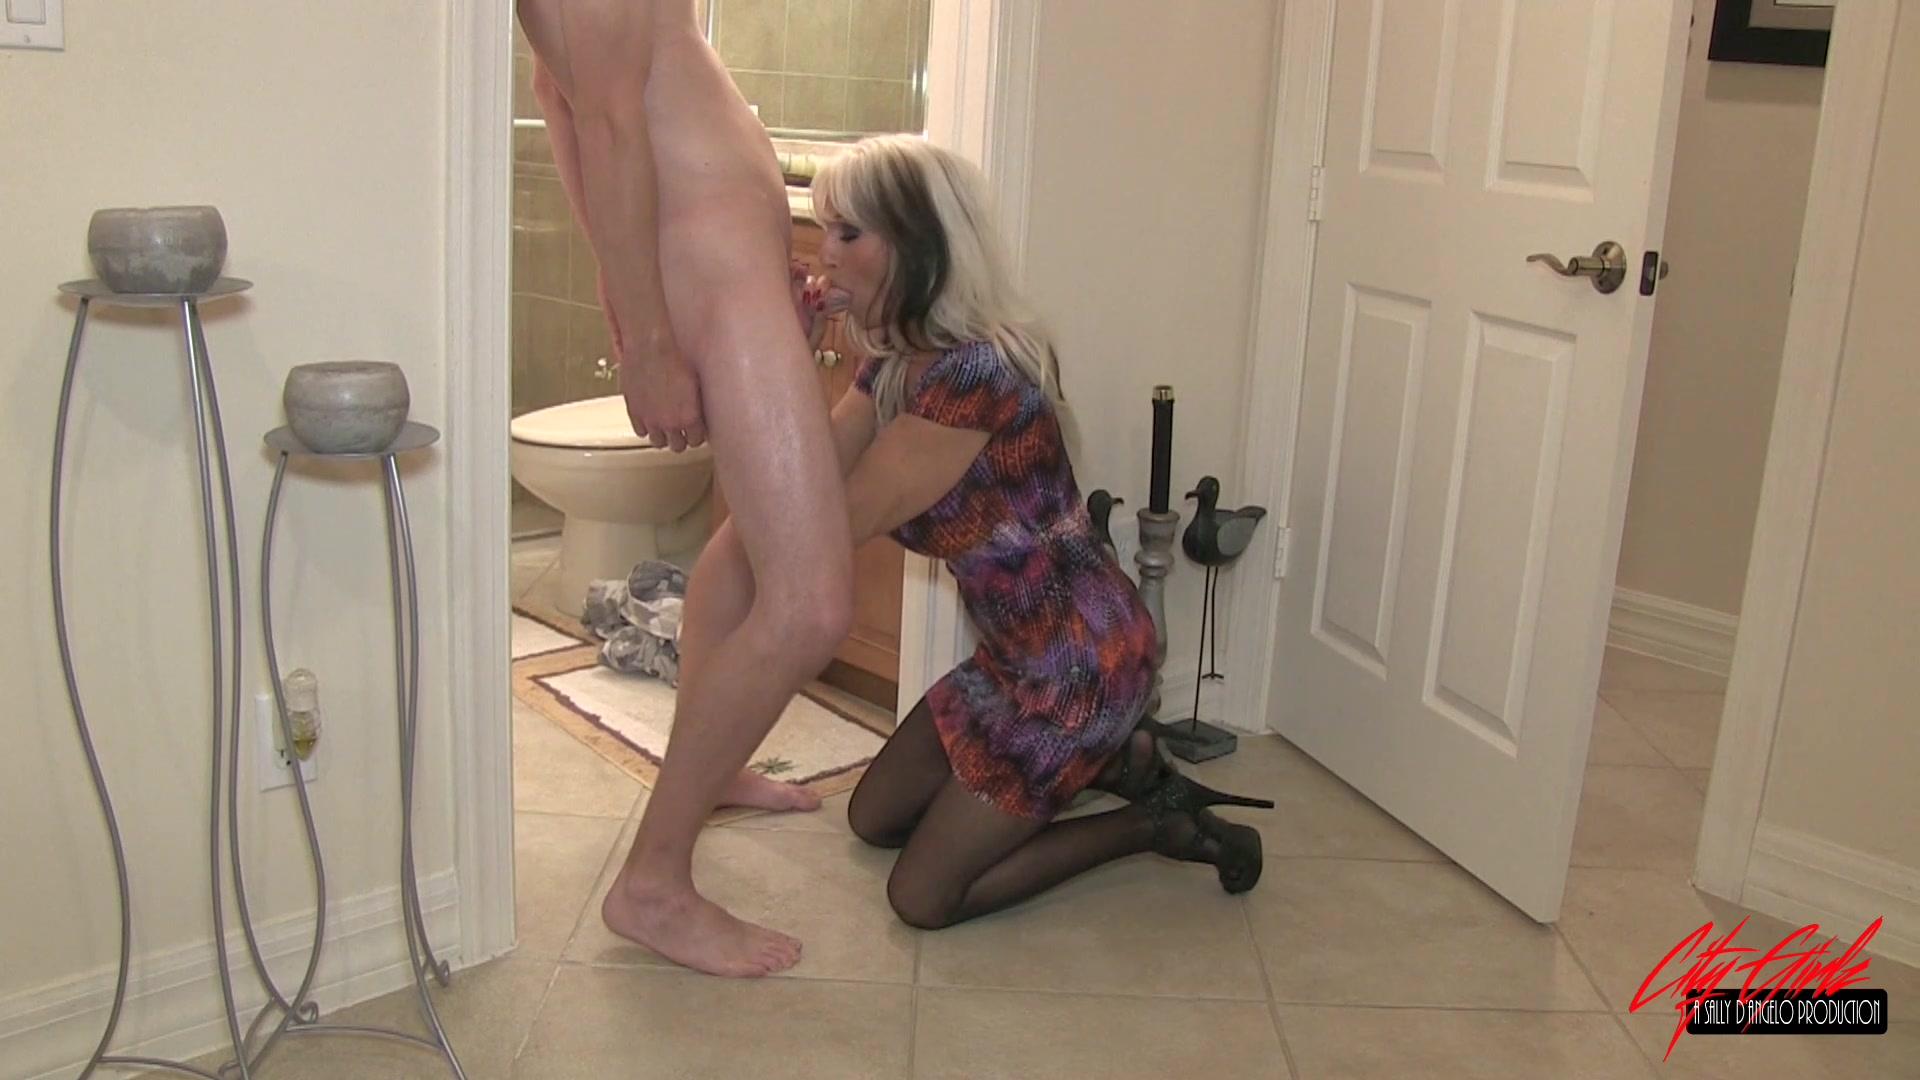 mary kate schellhardt sex